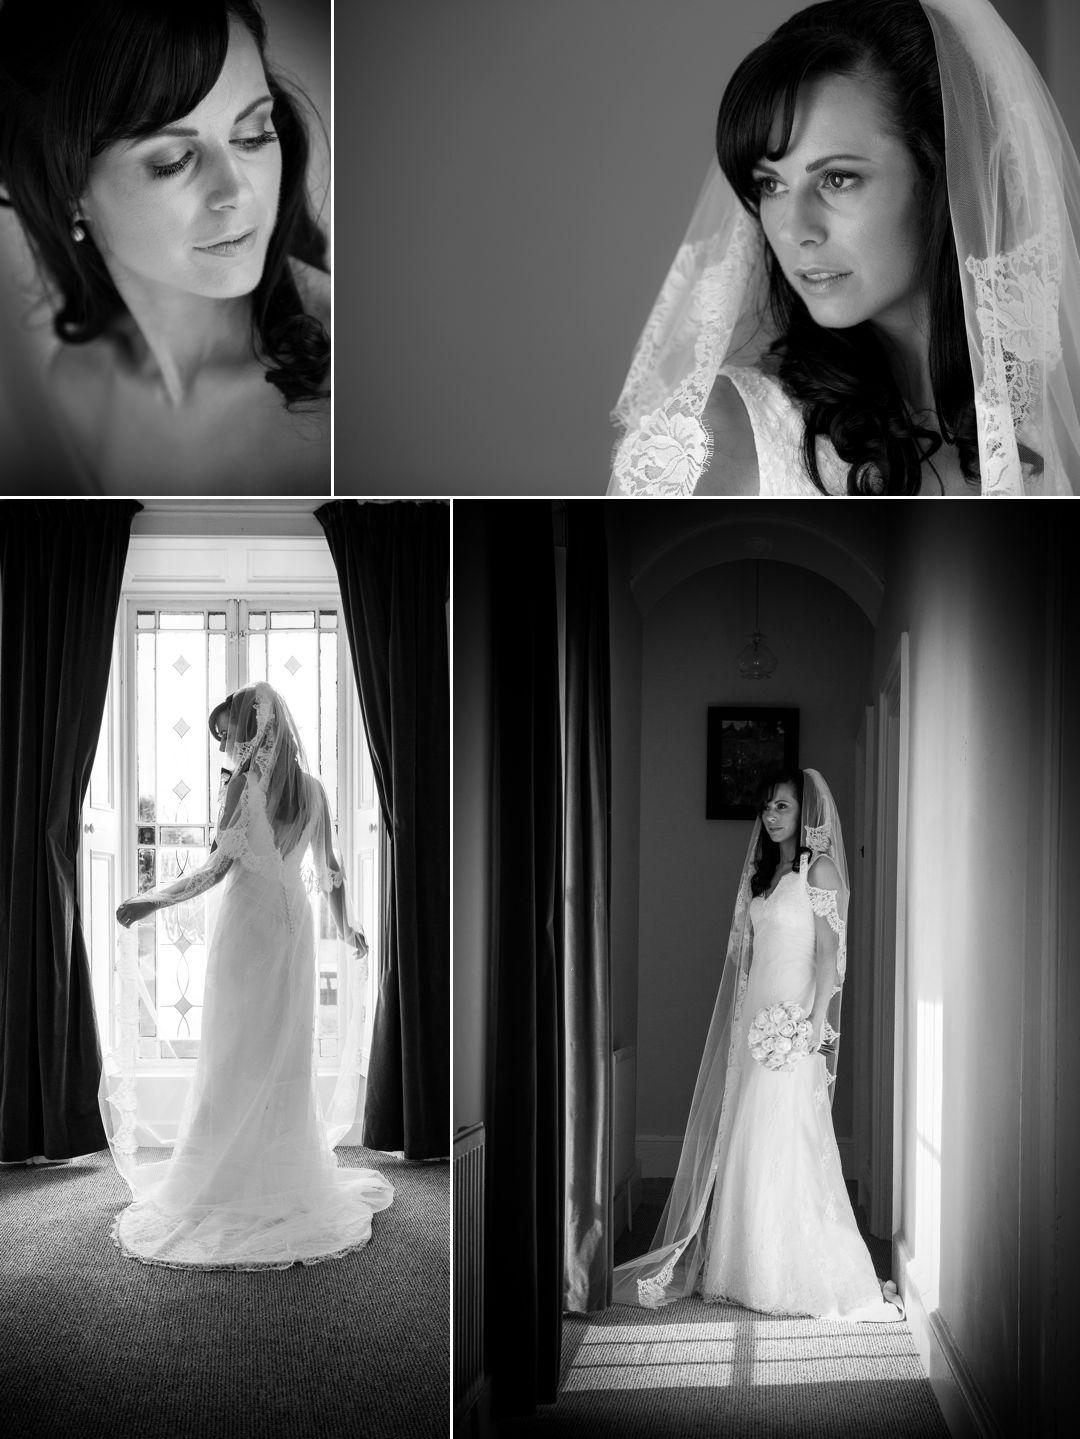 20 September 2013 / Kilronan Castle MARY & ADRIAN number 7